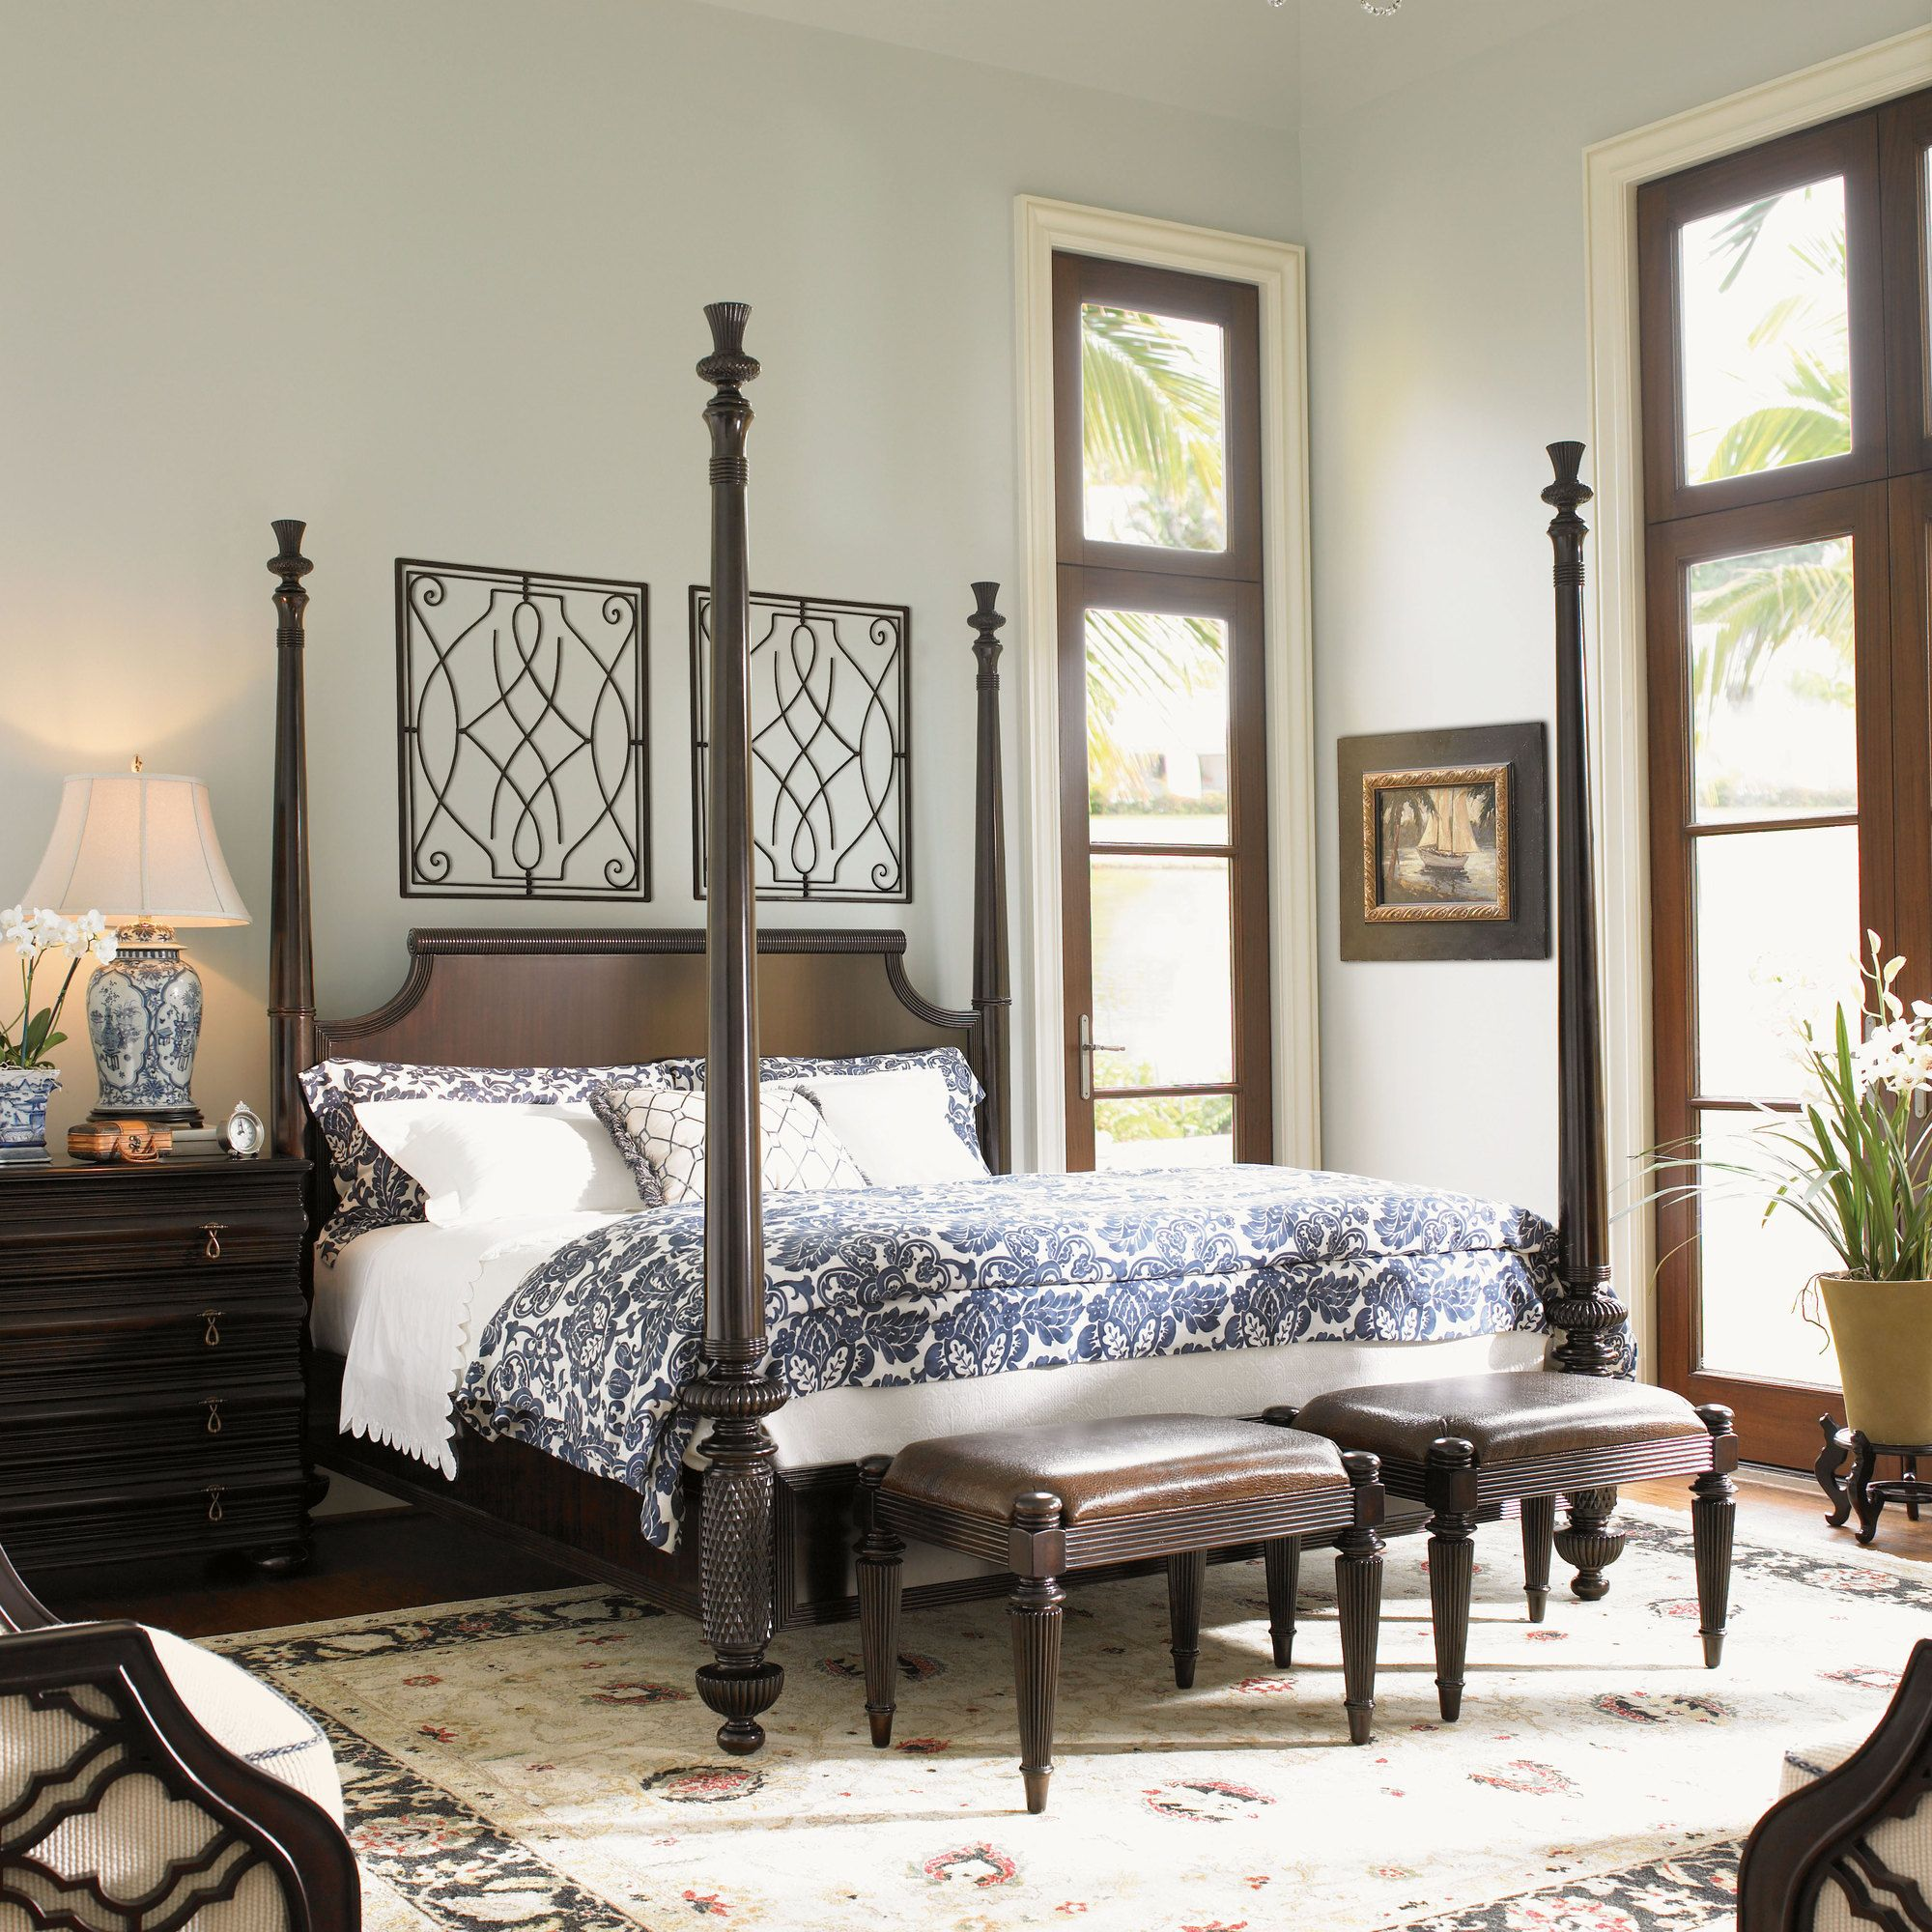 Royal Kahala Canopy Bed |   | Pinterest | Bedroom ...